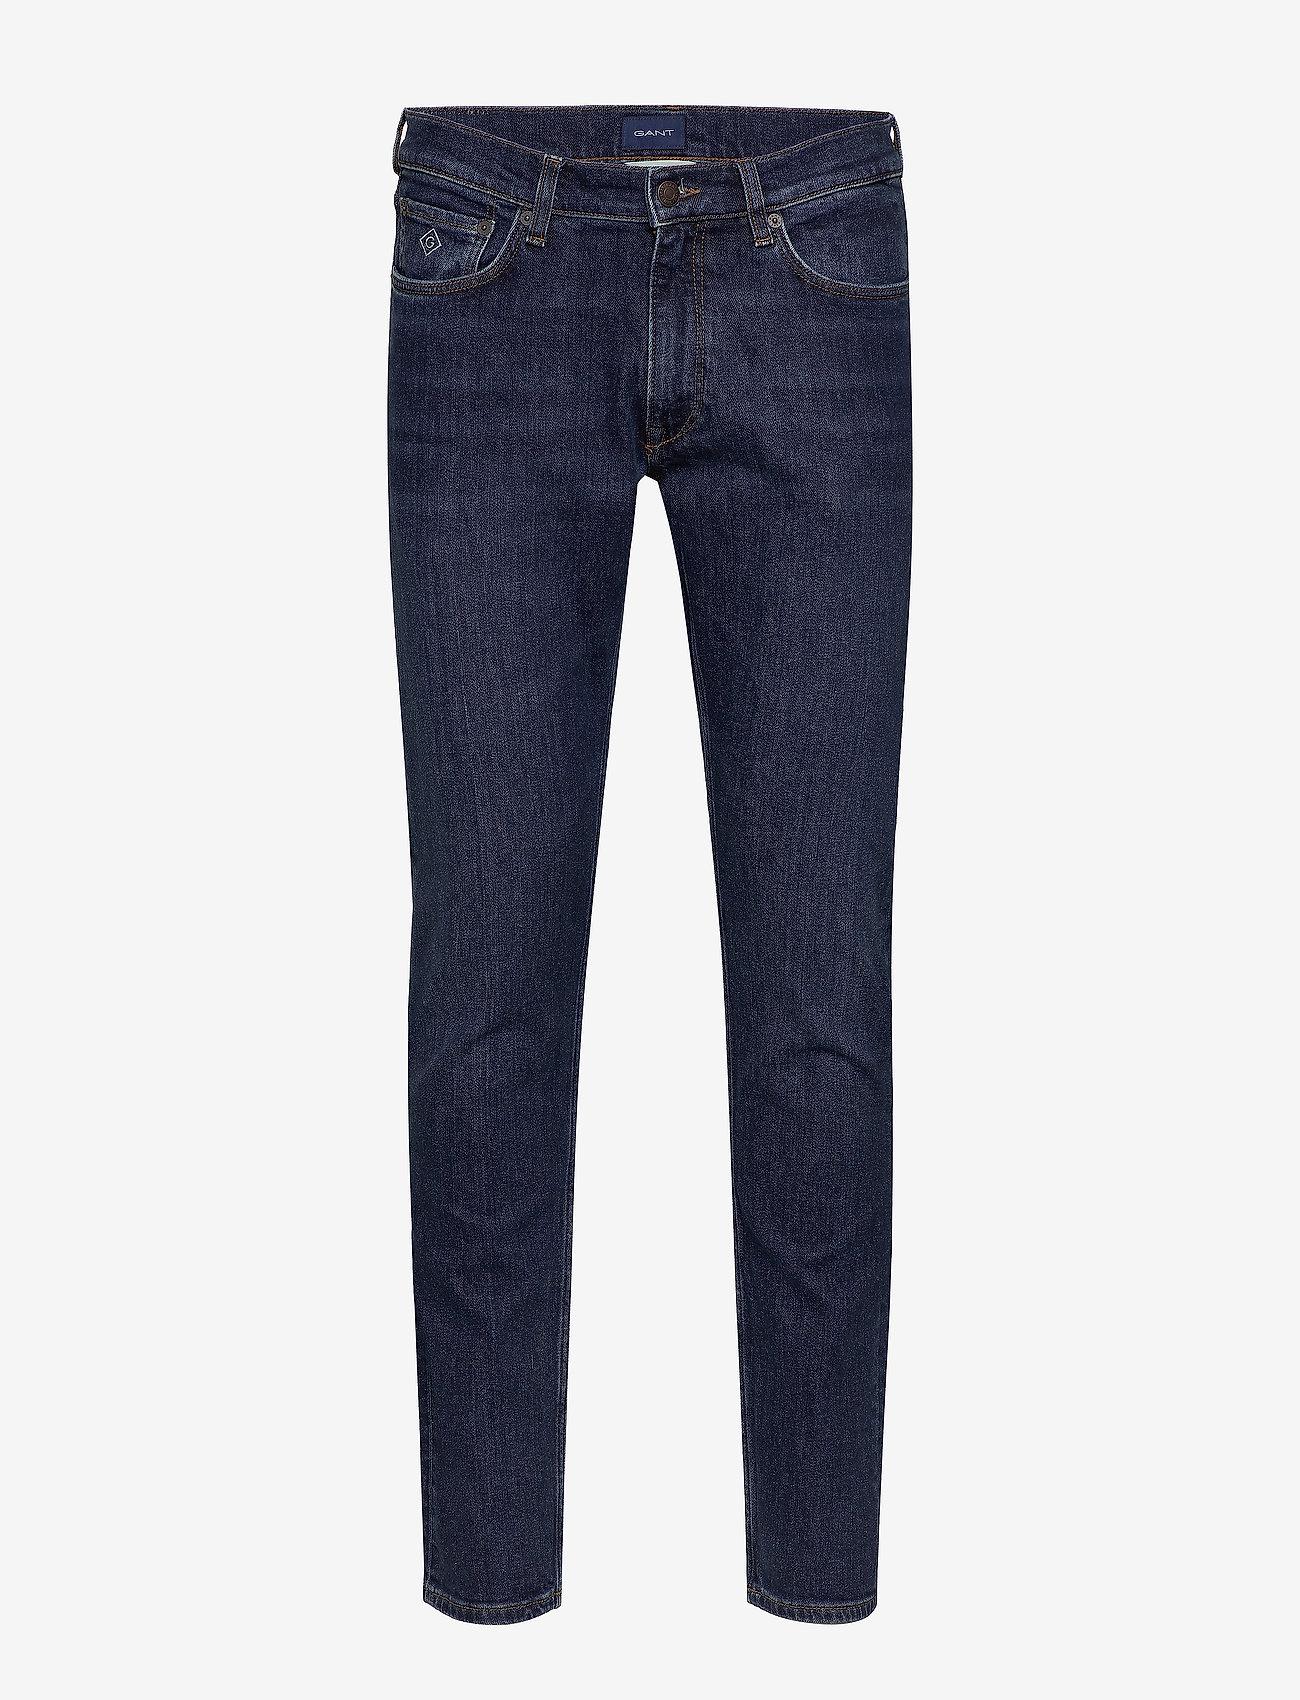 GANT - D1. TAPERED GANT JEANS - slim jeans - dark blue worn in - 0